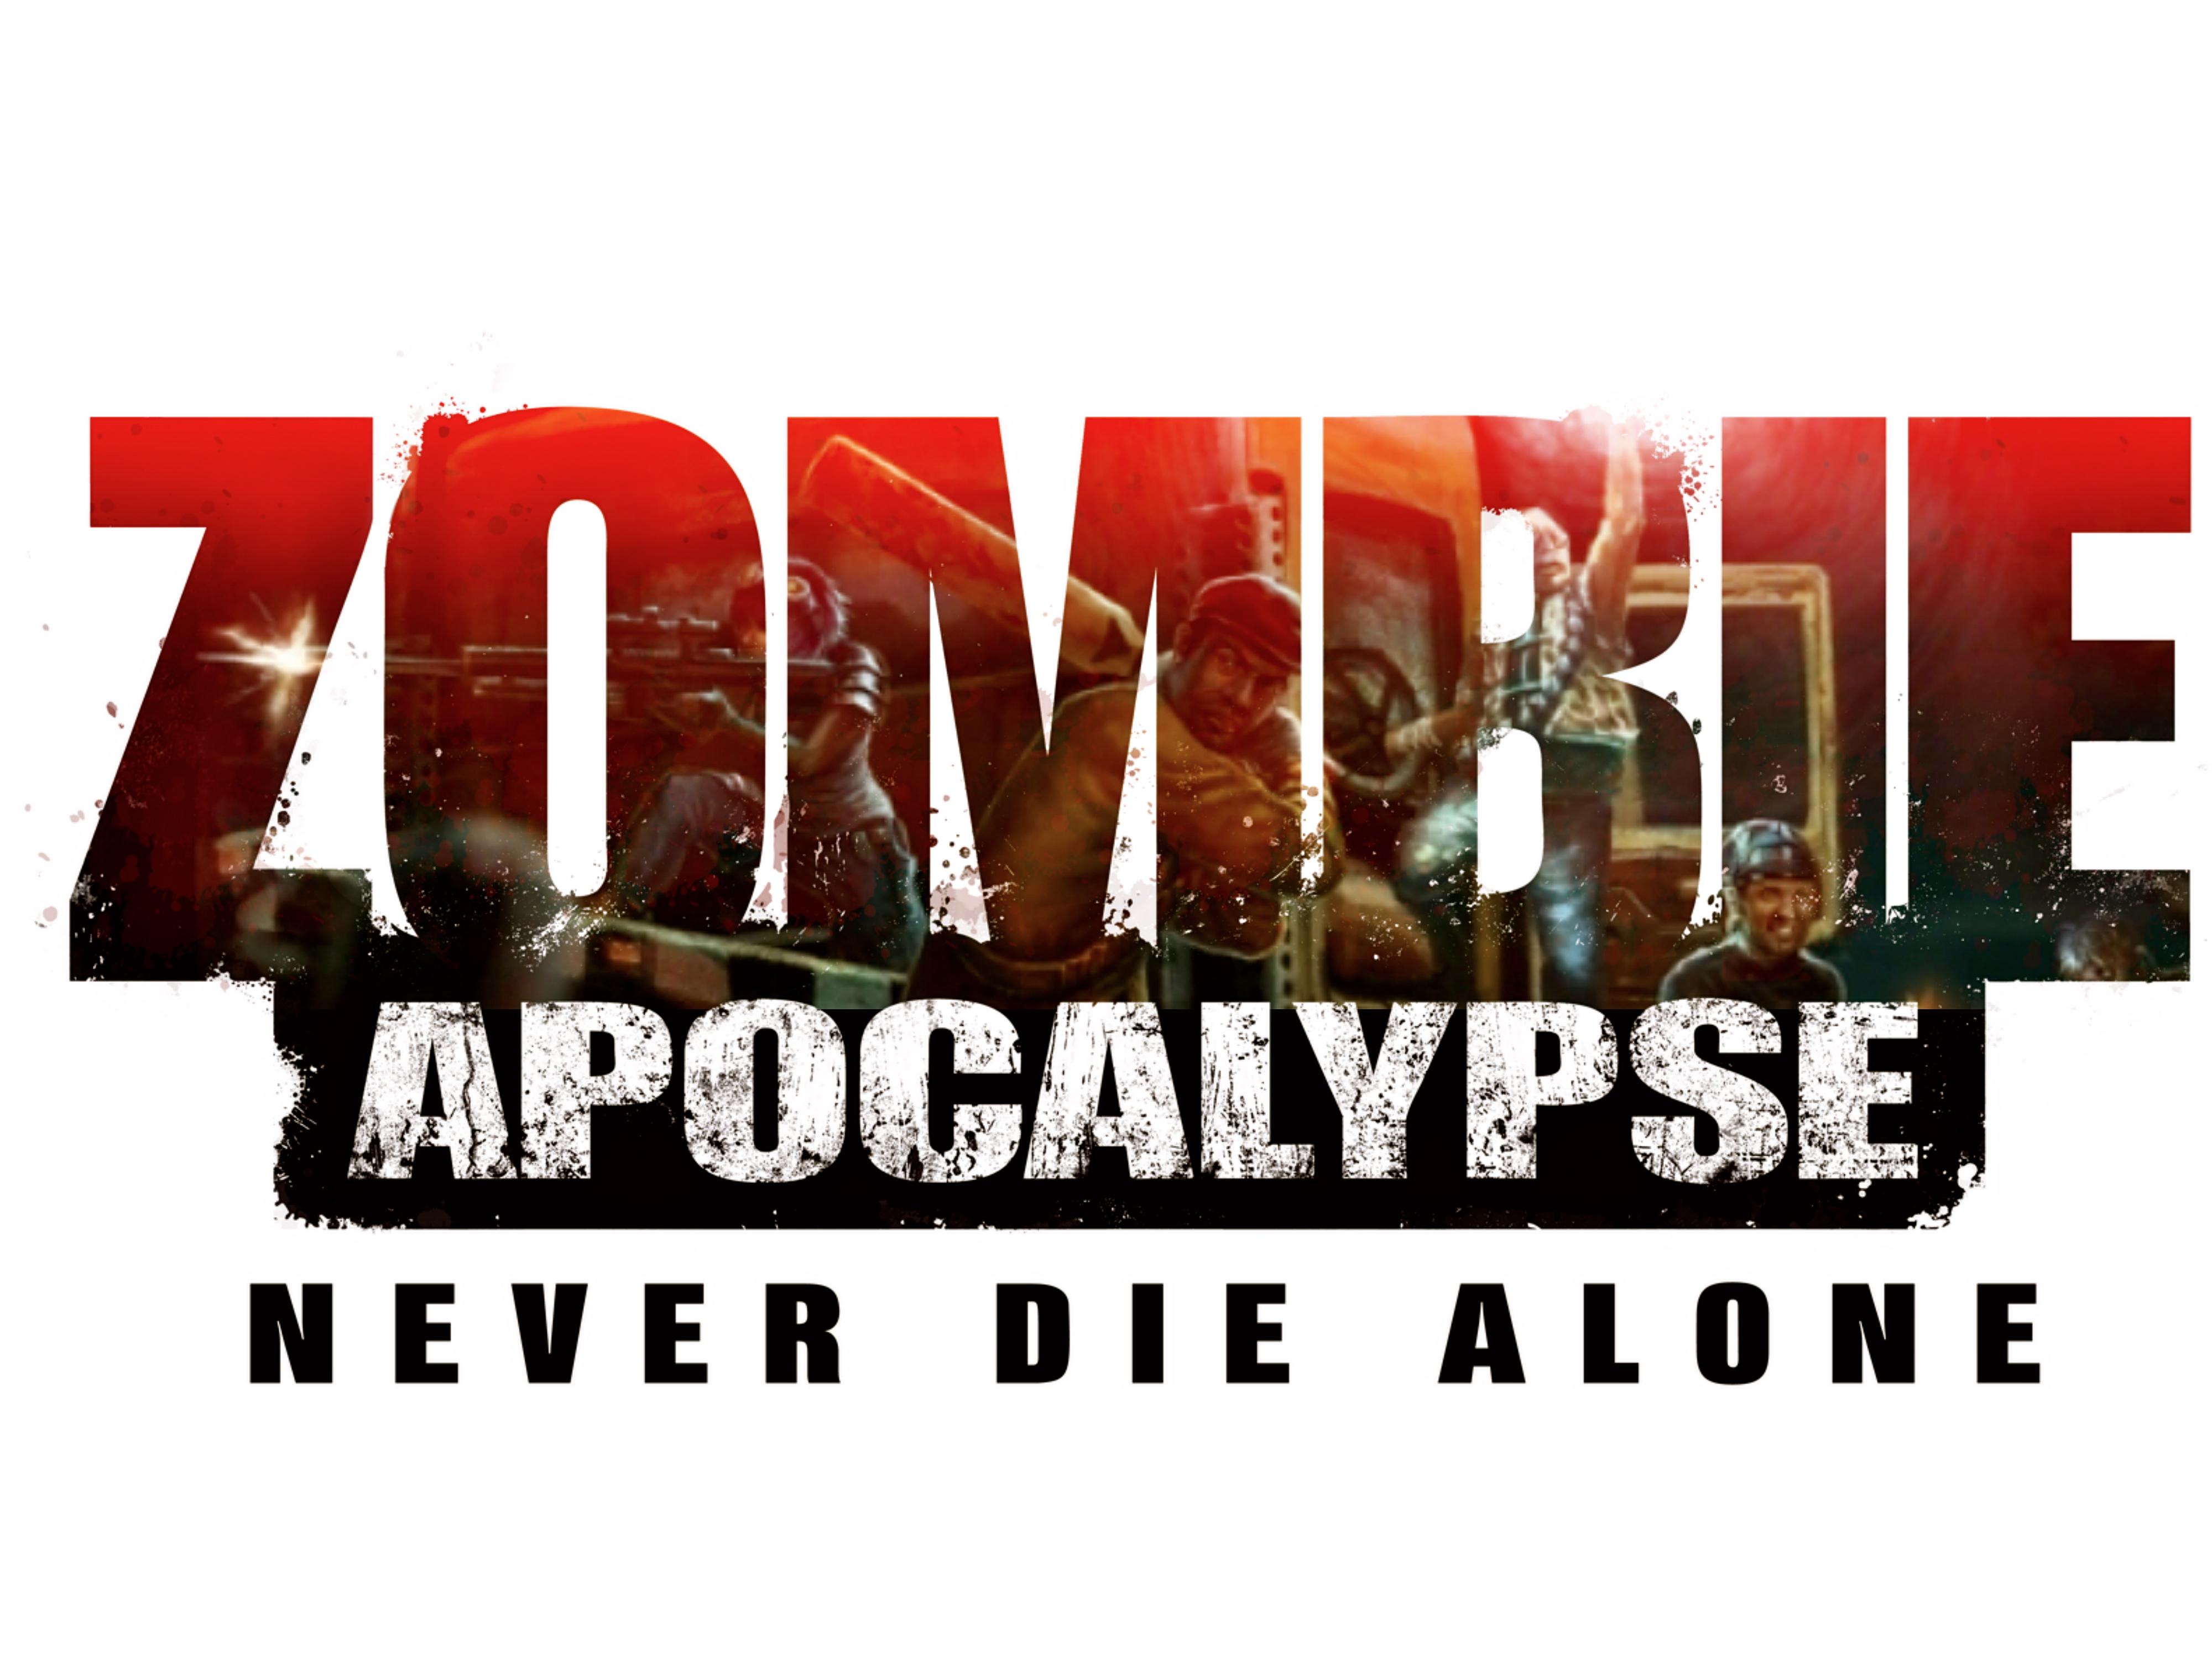 Zombie Apocalypse Wallpaper wallpaper wallpaper hd background 4000x3000